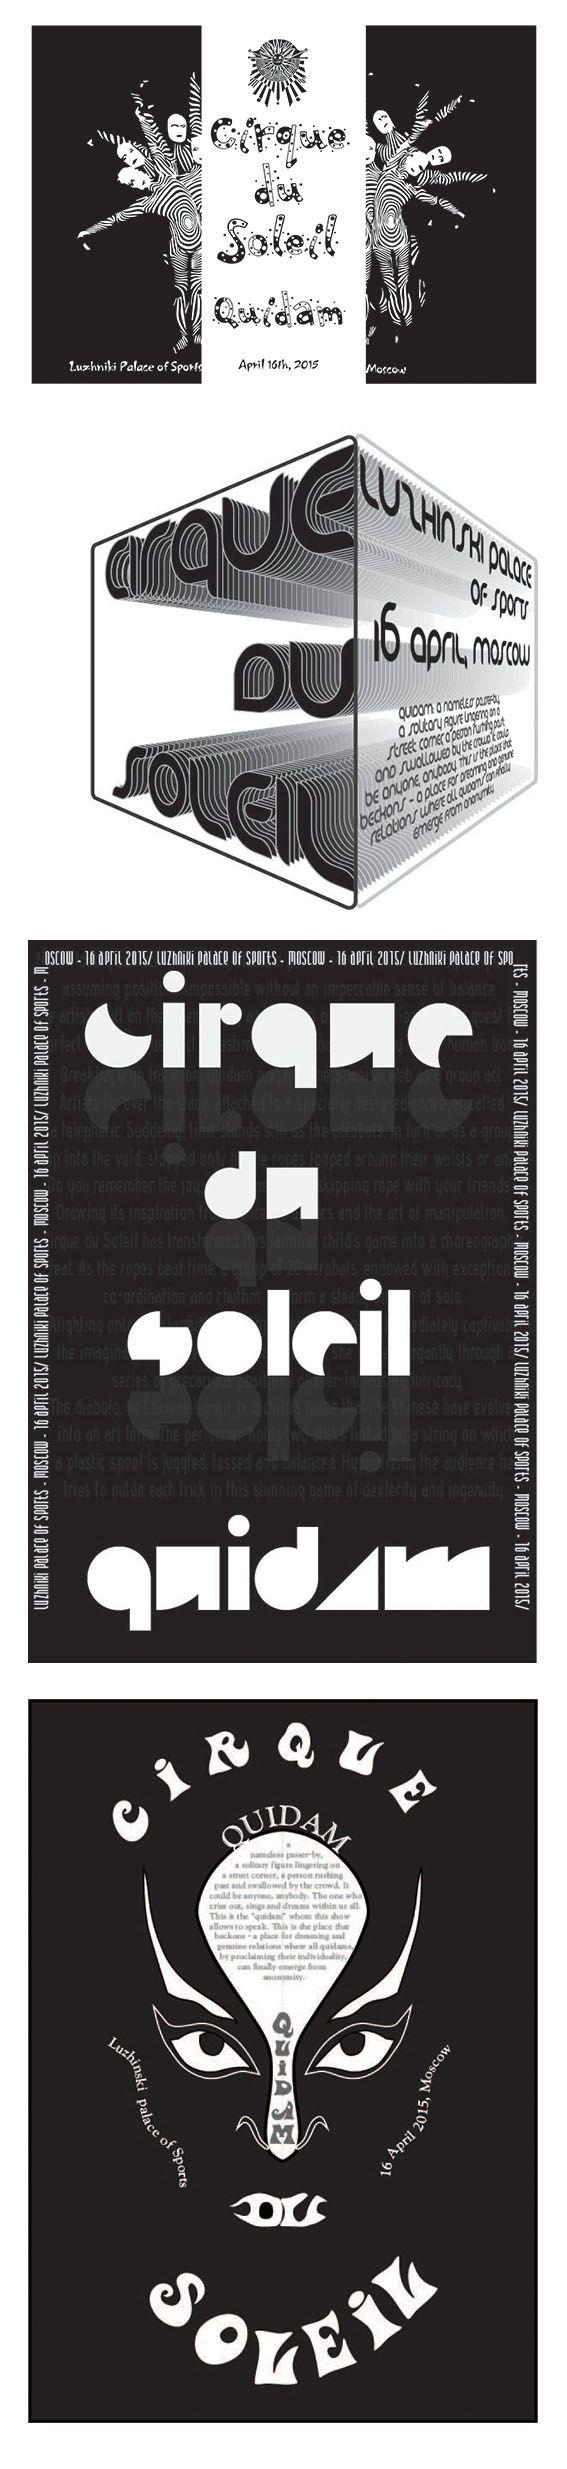 / Cirque du soleil gig posters. //